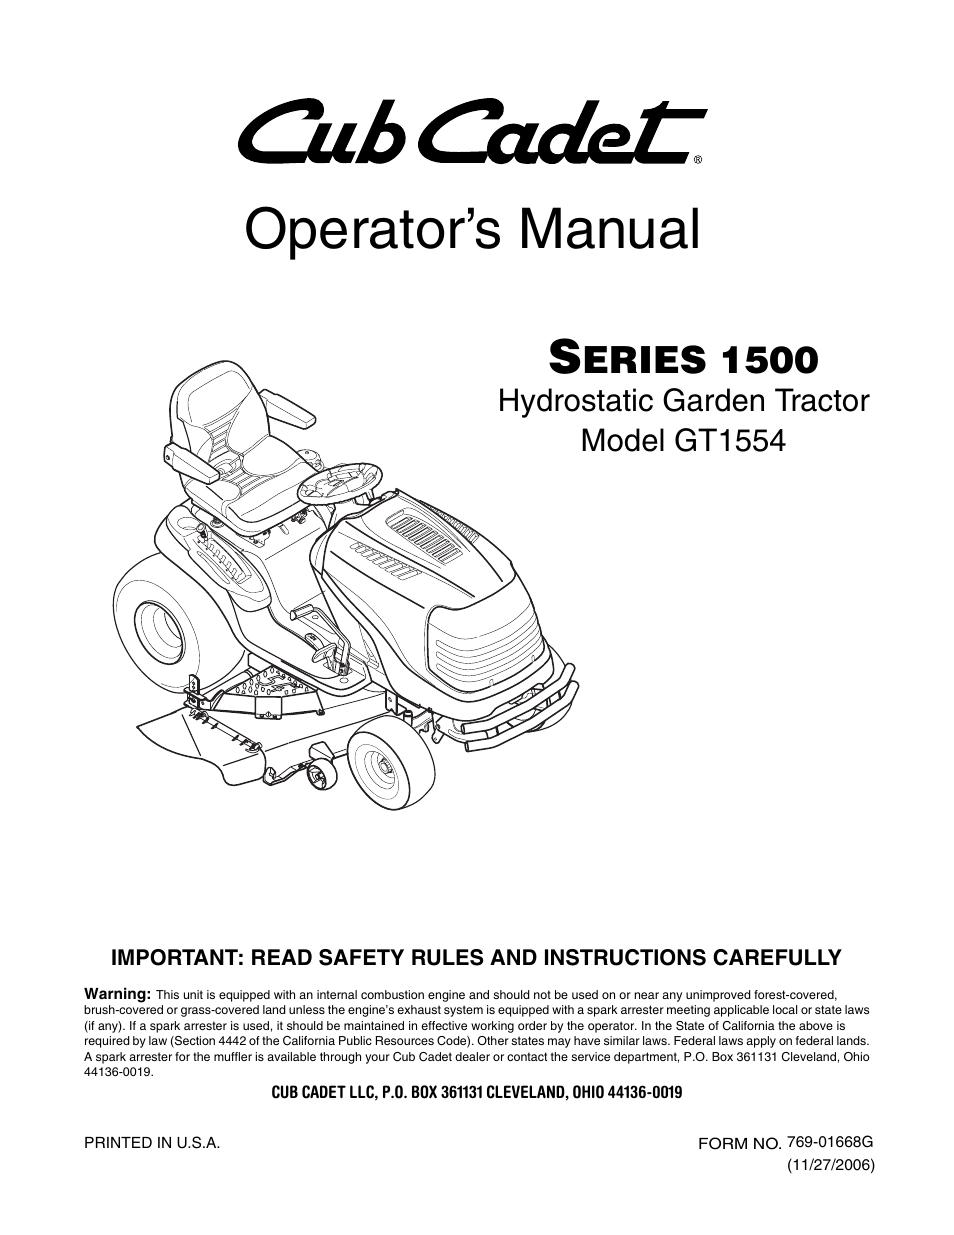 cub cadet gt 1554 manual enthusiast wiring diagrams